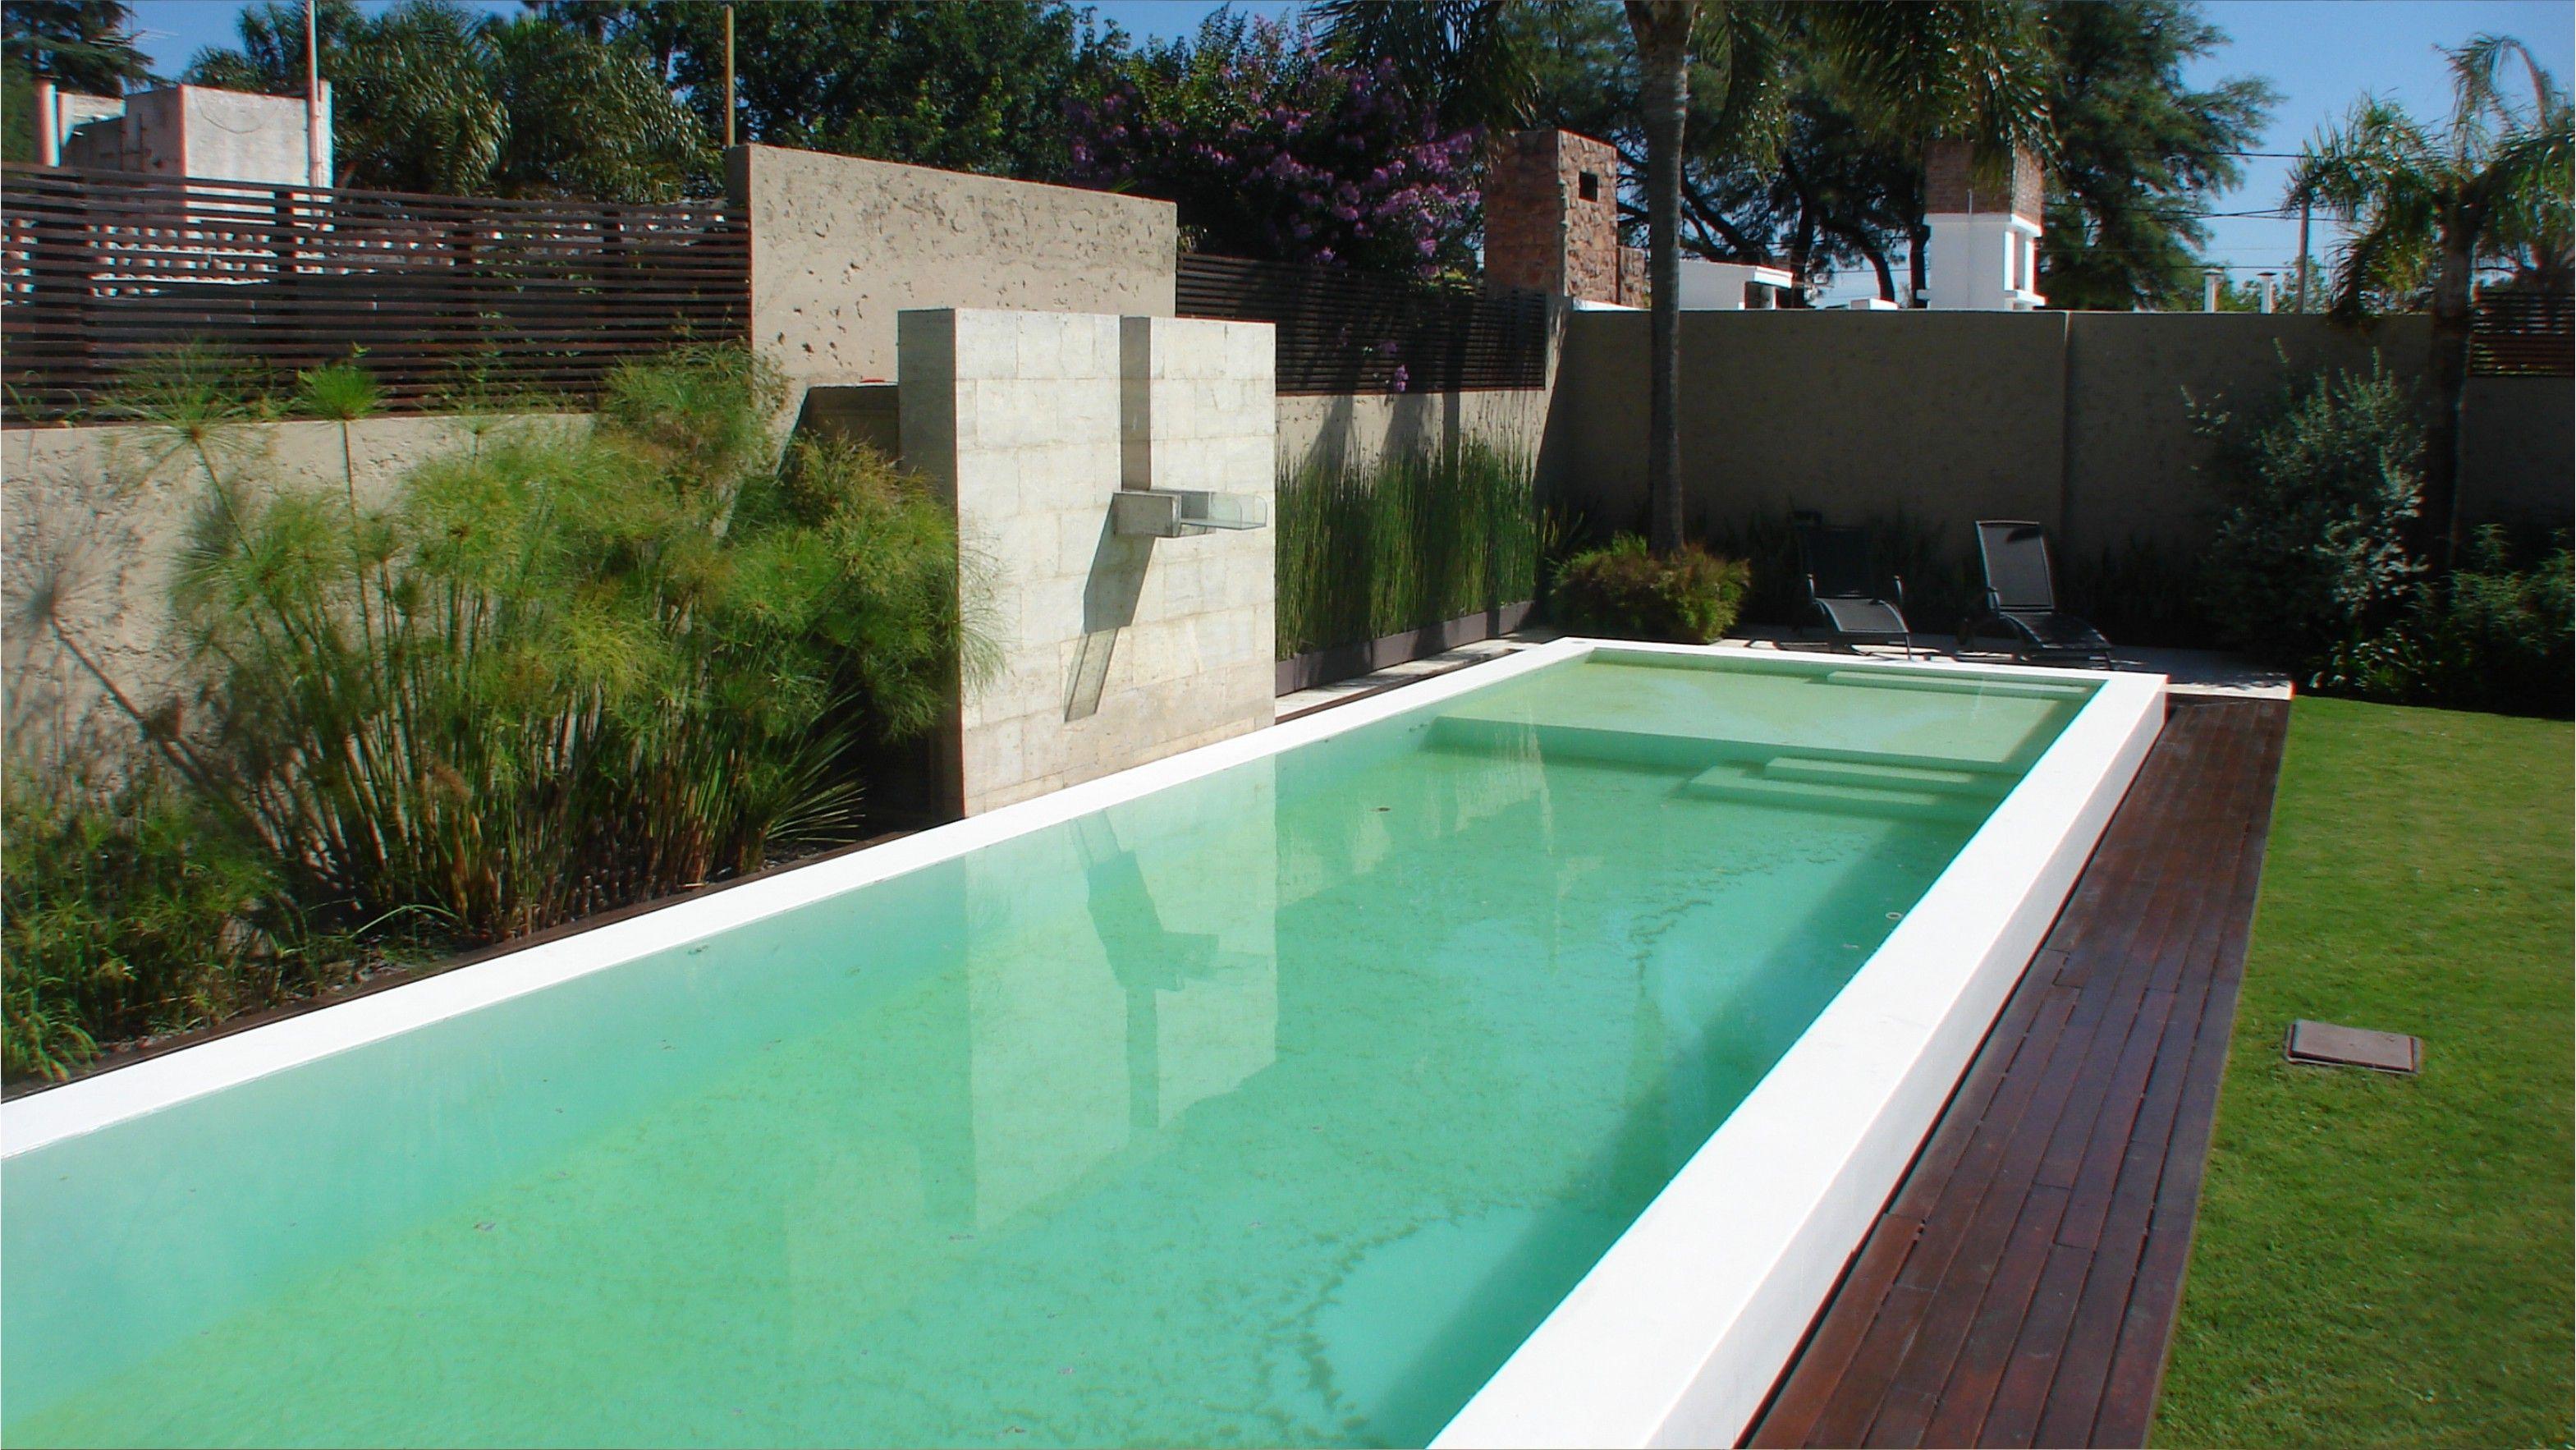 piscina - desborde finlandes - deck - piscina - swimmingpool